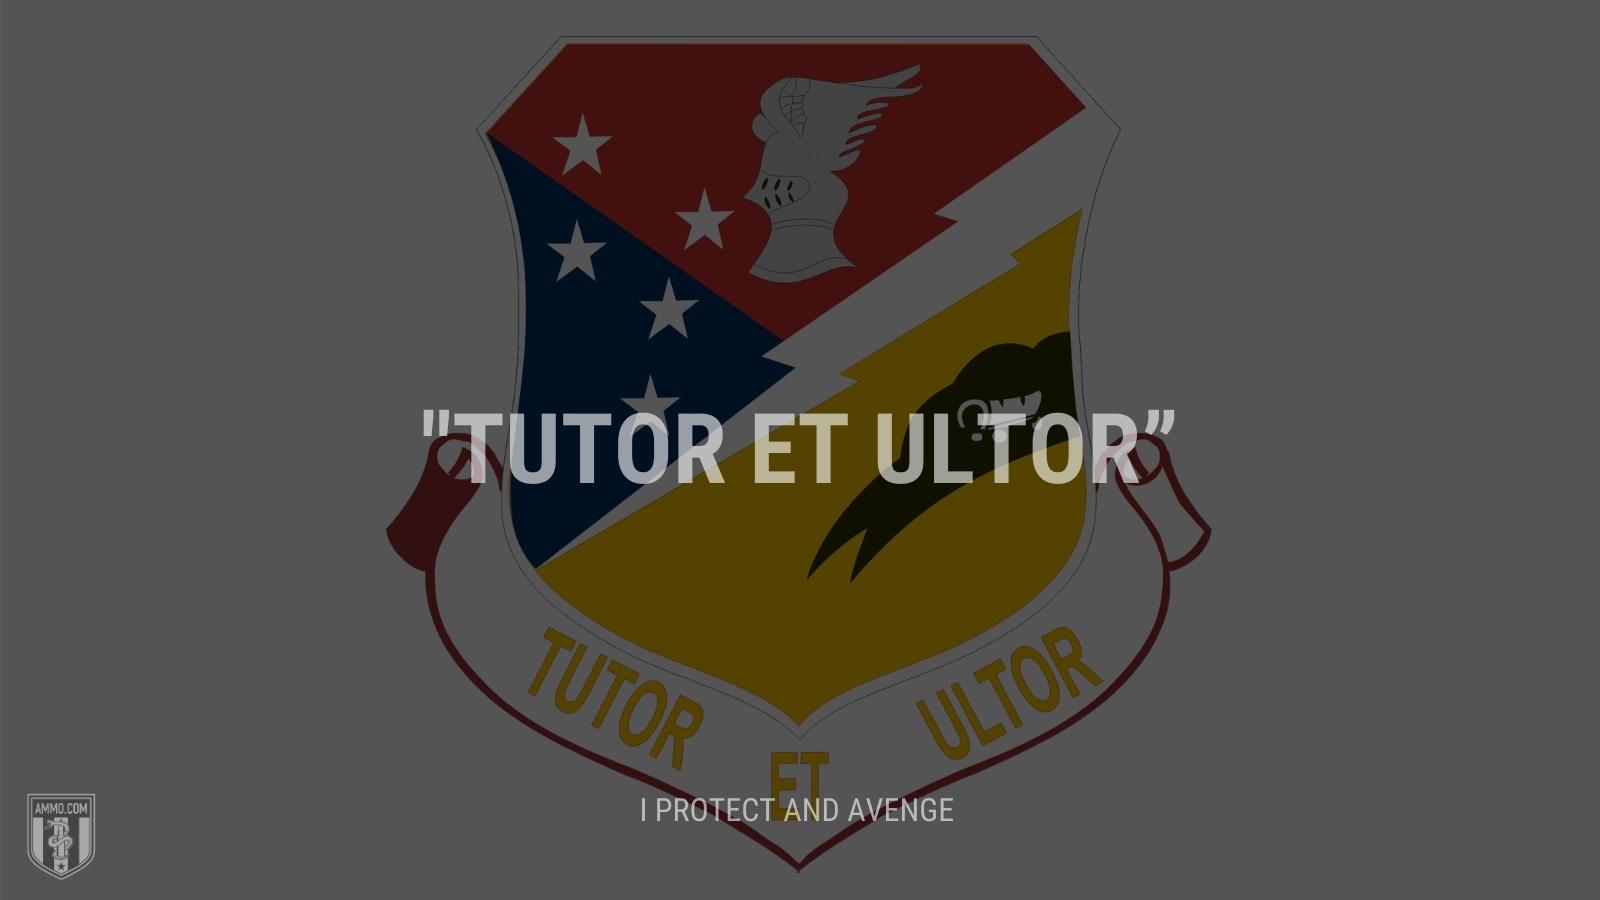 """Tutor et ultor"" - I protect and avenge"